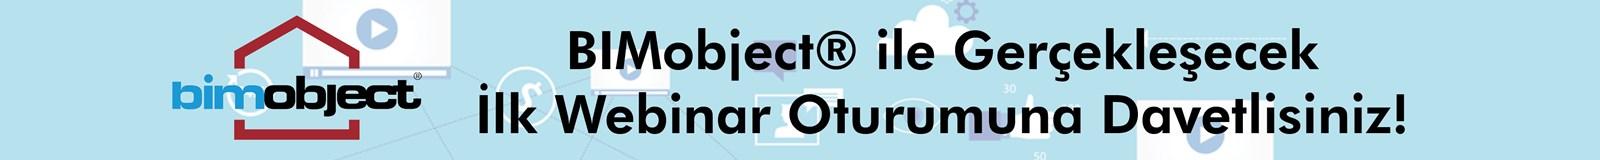 BIMobject-webinar kayit